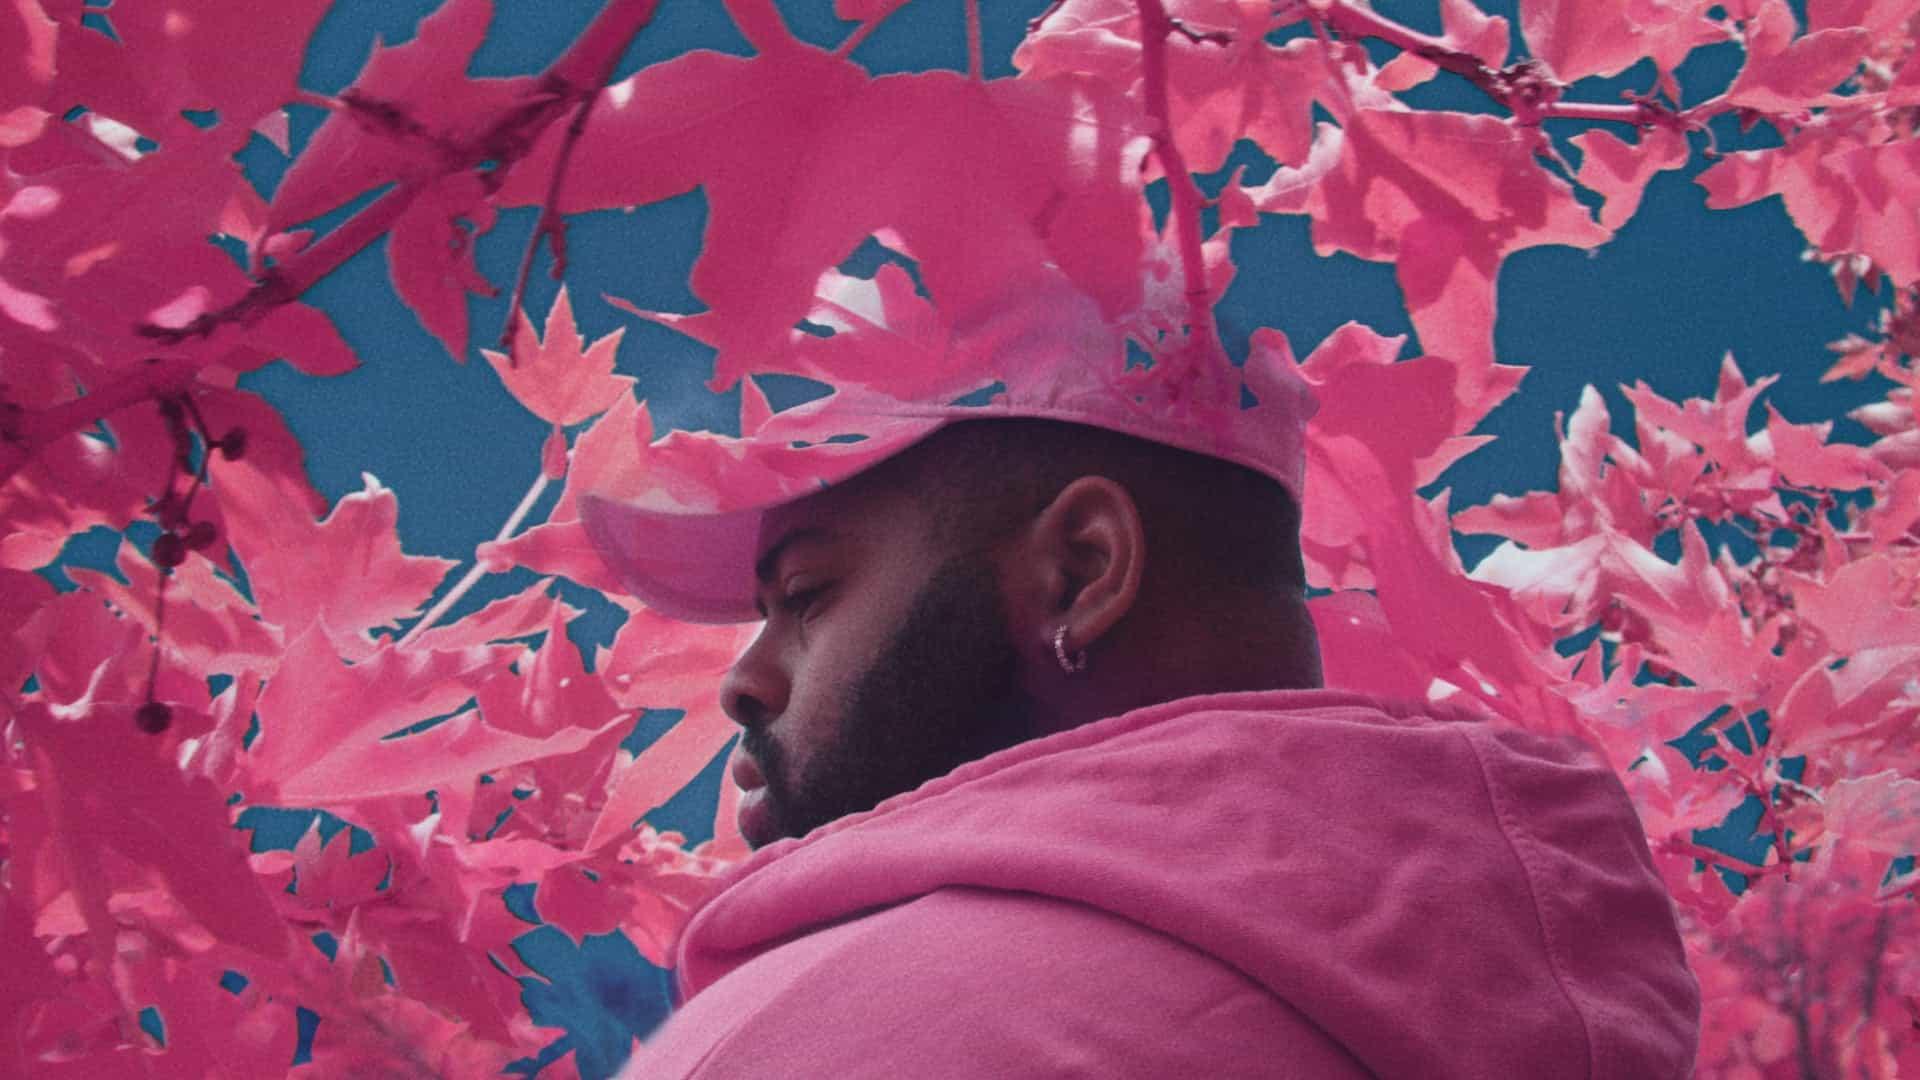 Pabst Blue Ribbon ft. Pink Sweats